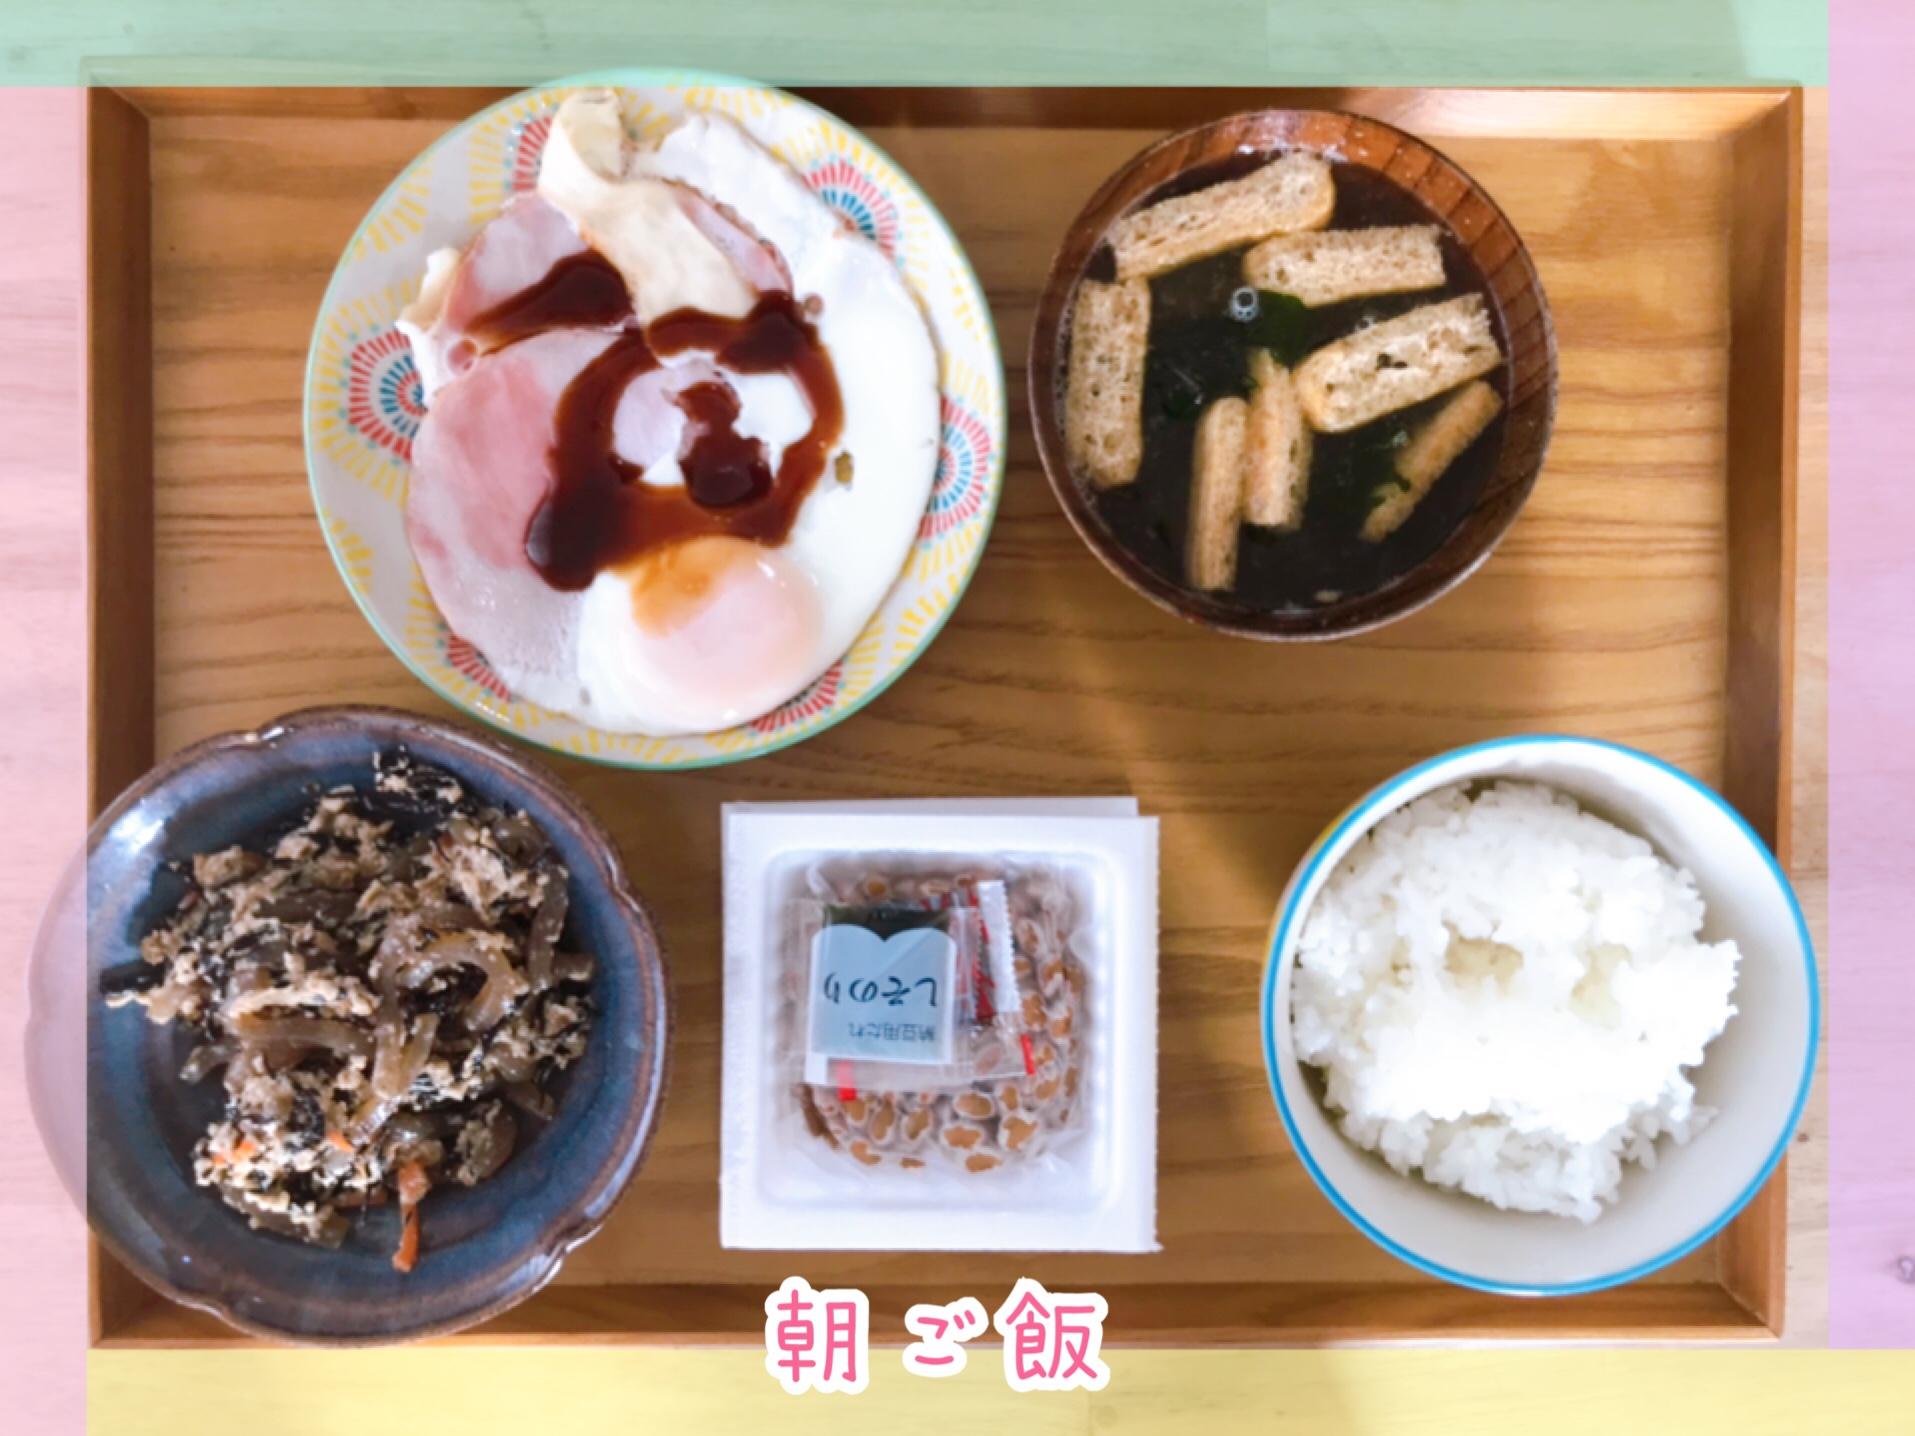 nosh(ナッシュ)ダイエット挑戦ブログ